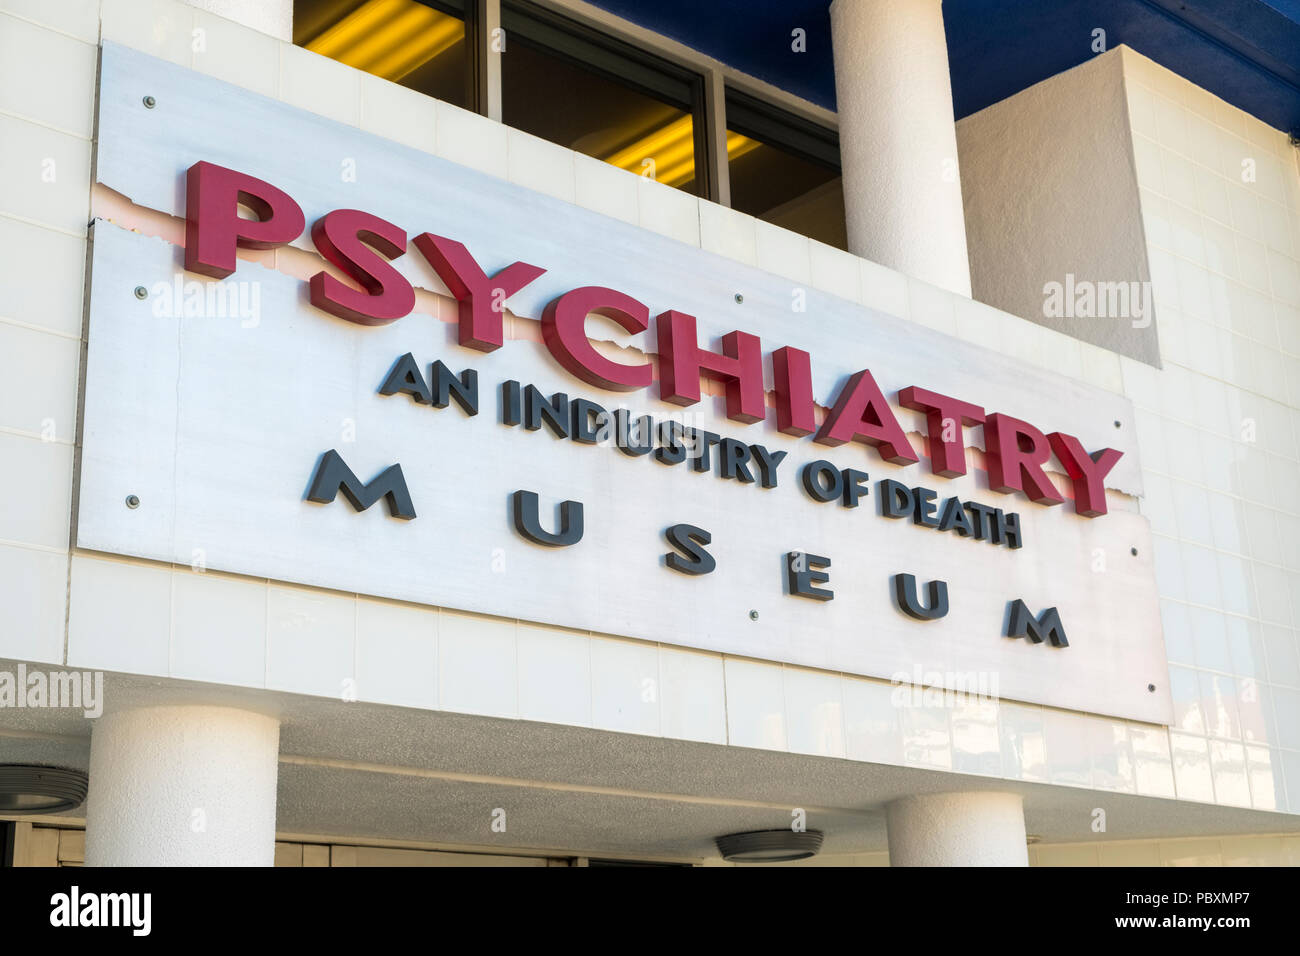 Psychiatrie une industrie de la mort museum, Hollywood, Los Angeles, Californie, LA, CA,USA, logo sign Photo Stock